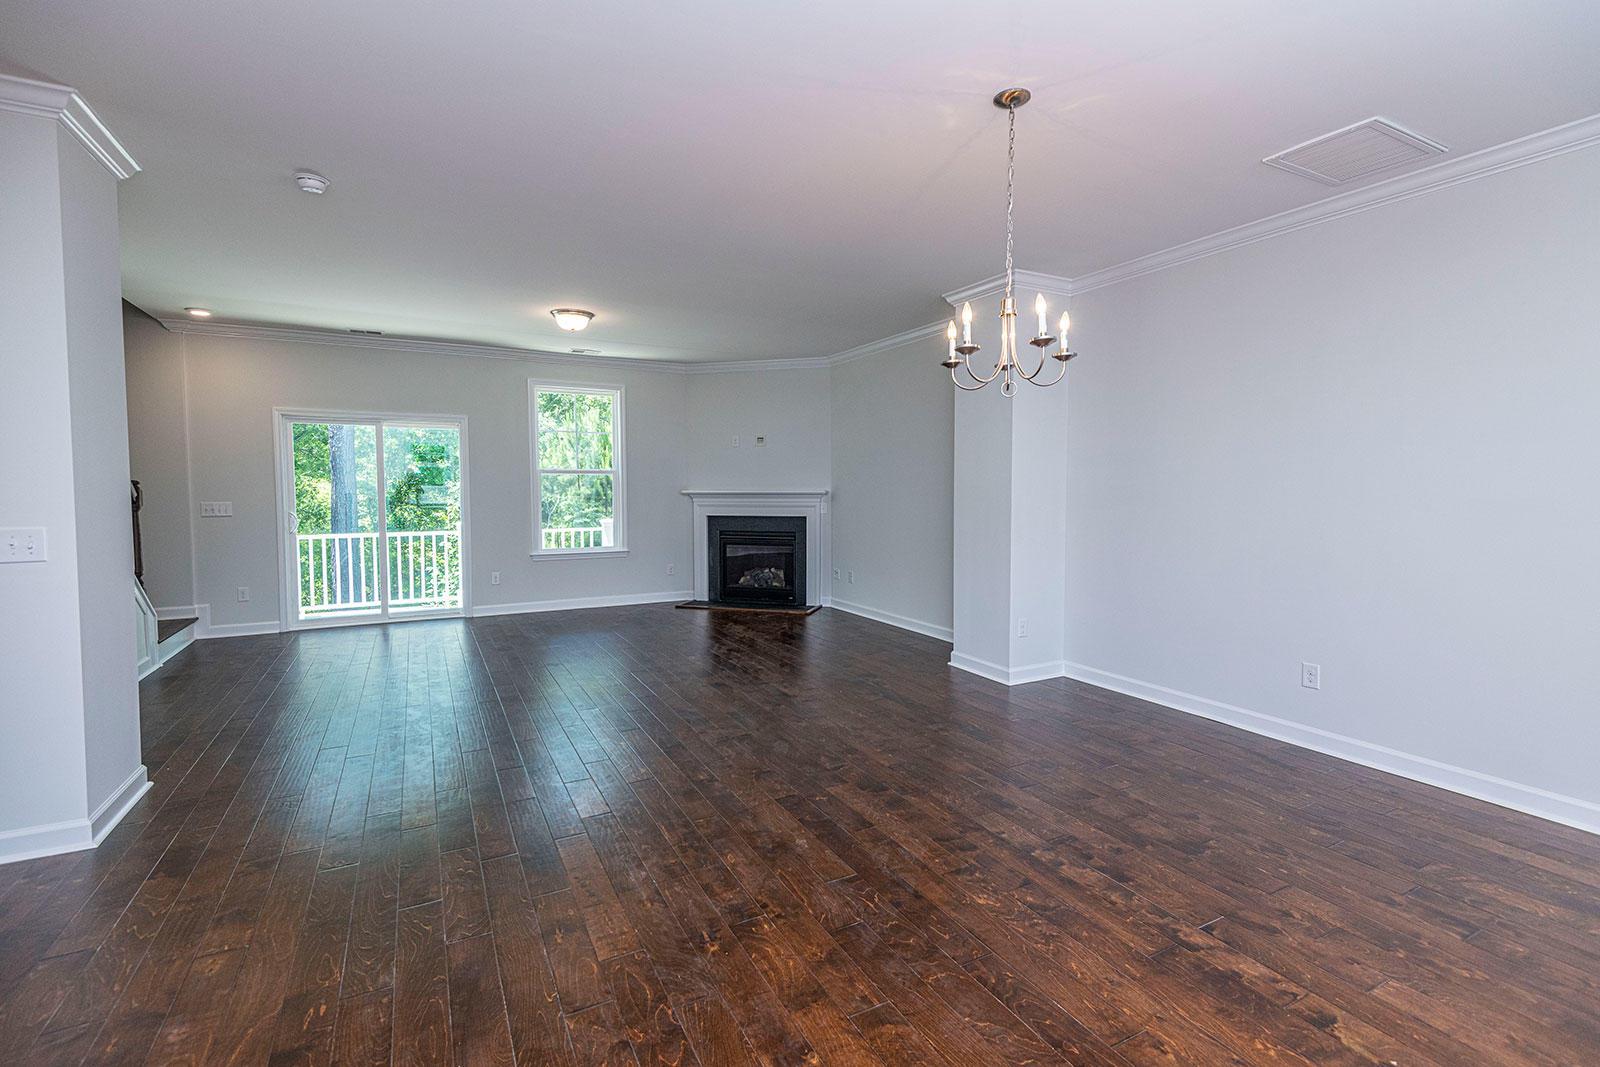 Park West Homes For Sale - 1565 Moss Spring, Mount Pleasant, SC - 10